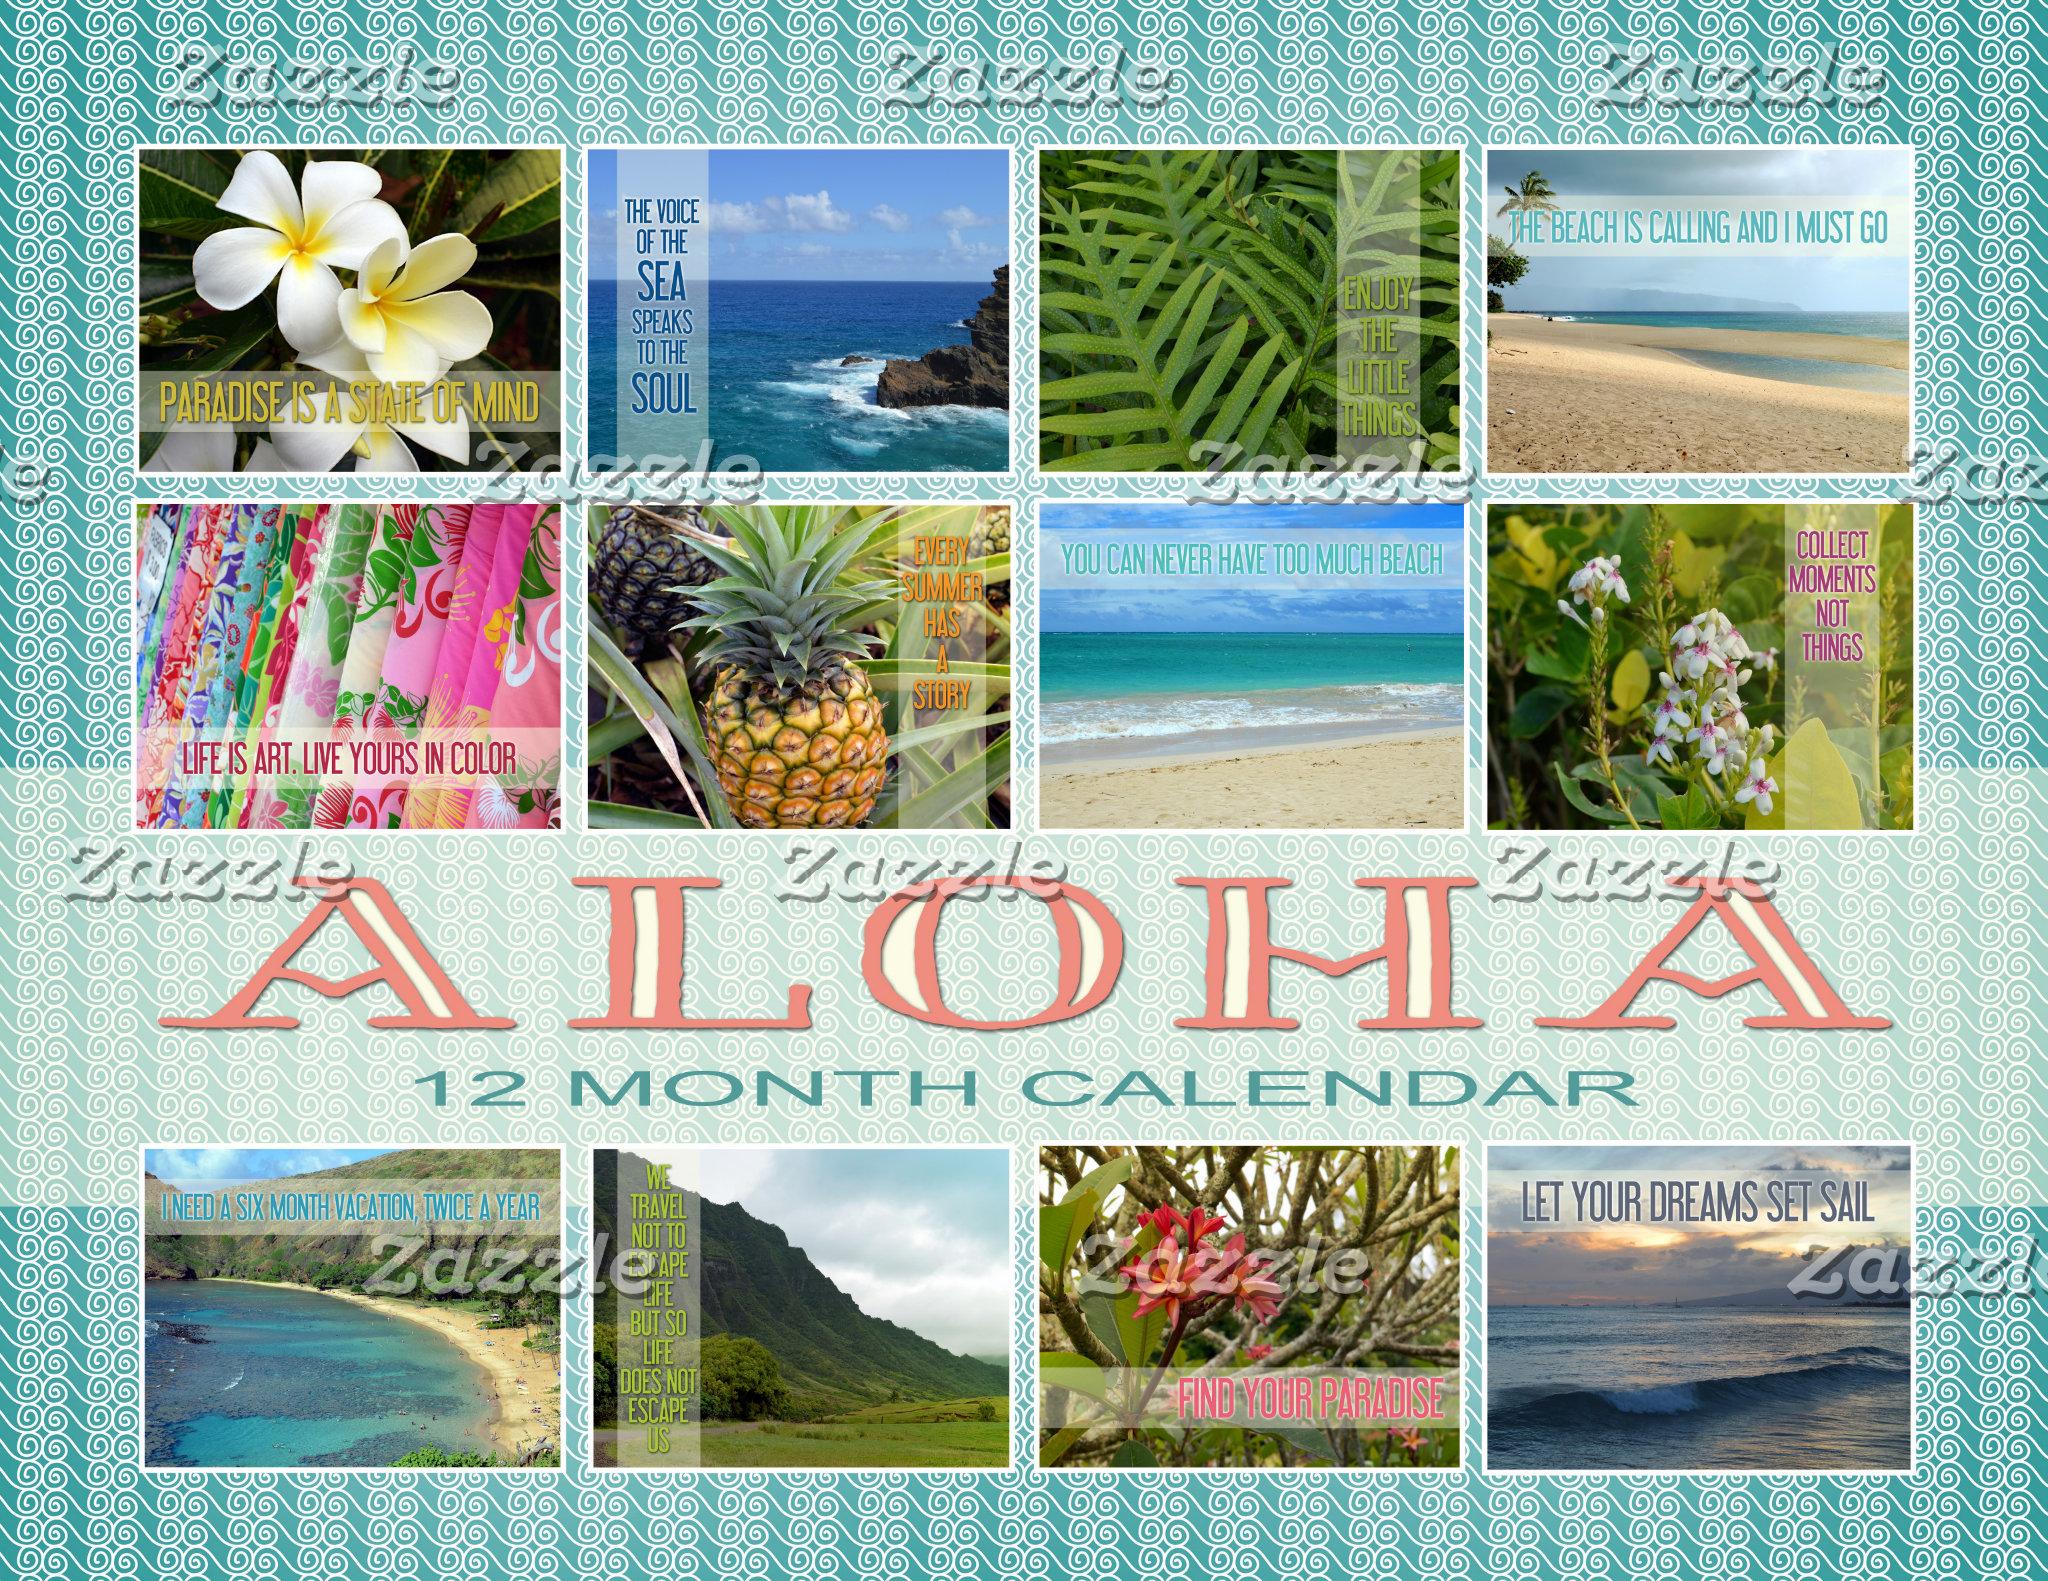 Aloha Hawaii Calendar